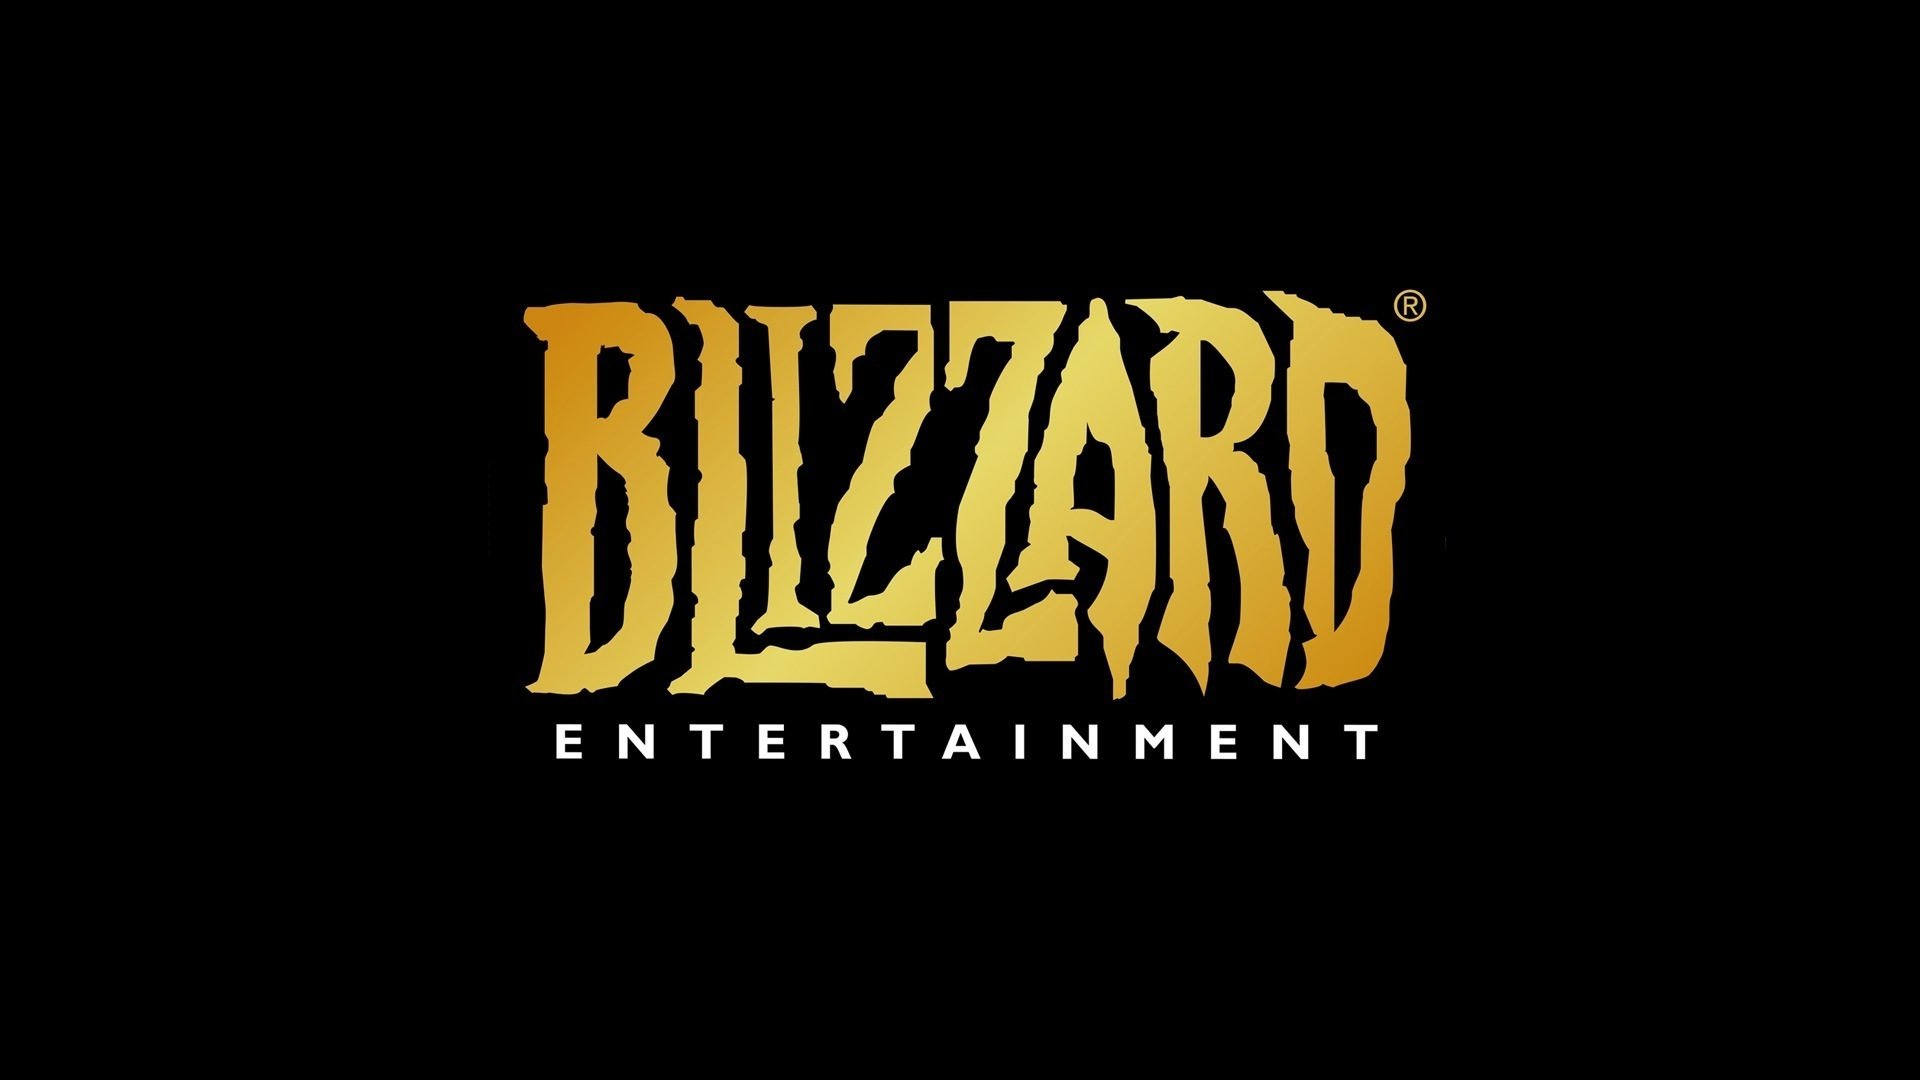 entertainment developers Blizzard Wallpapers HD Desktop Wallpapers 1920x1080